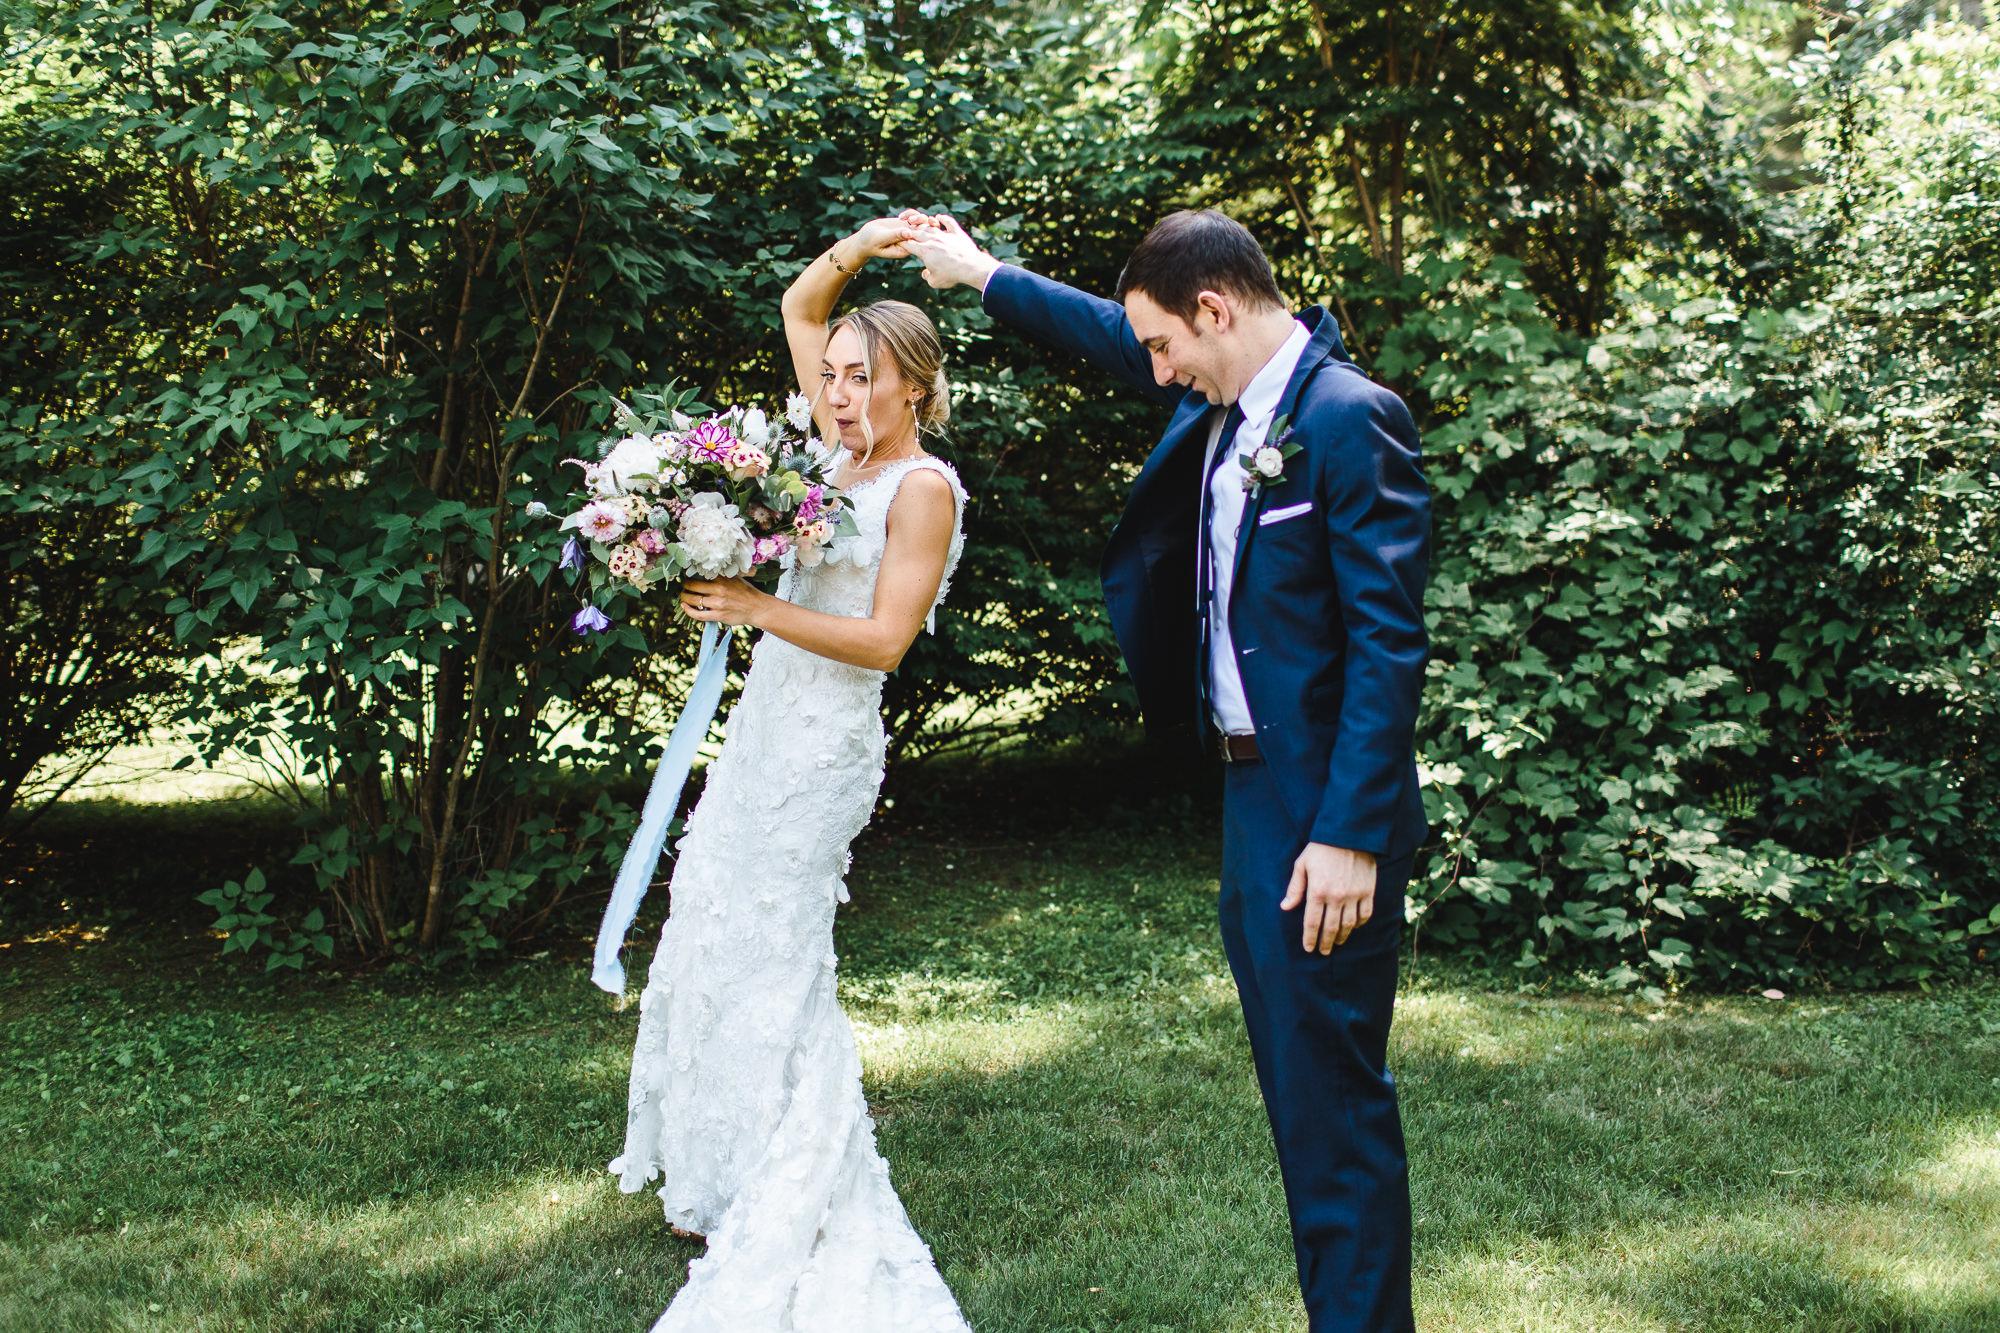 connecticut-summer-lake-wedding-emily-kirke-photography-upstyle (42 of 181).jpg